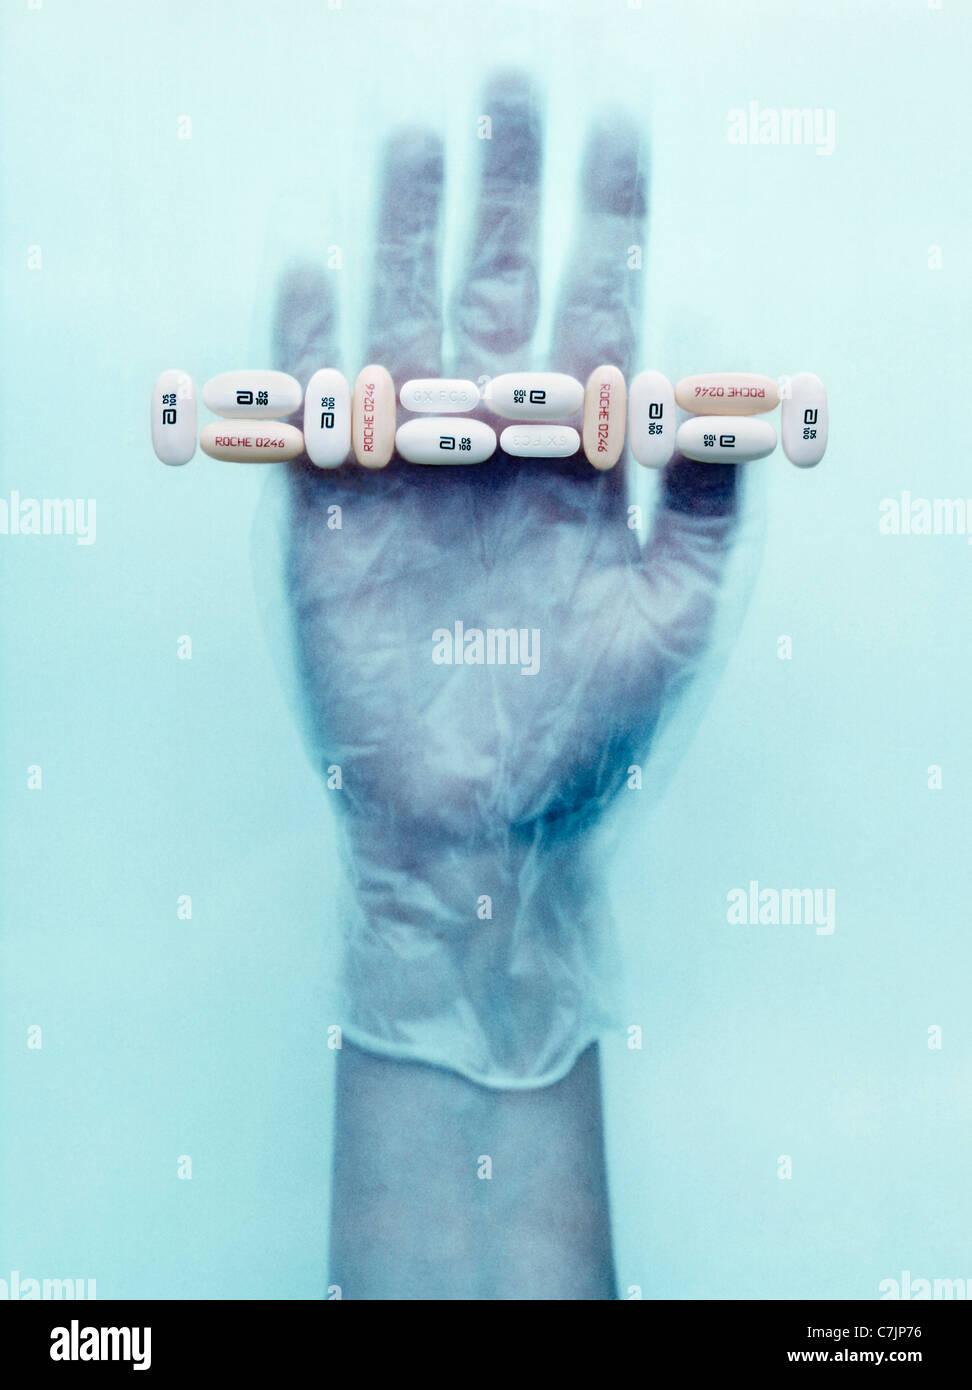 Gloved hand holding pills Photo Stock